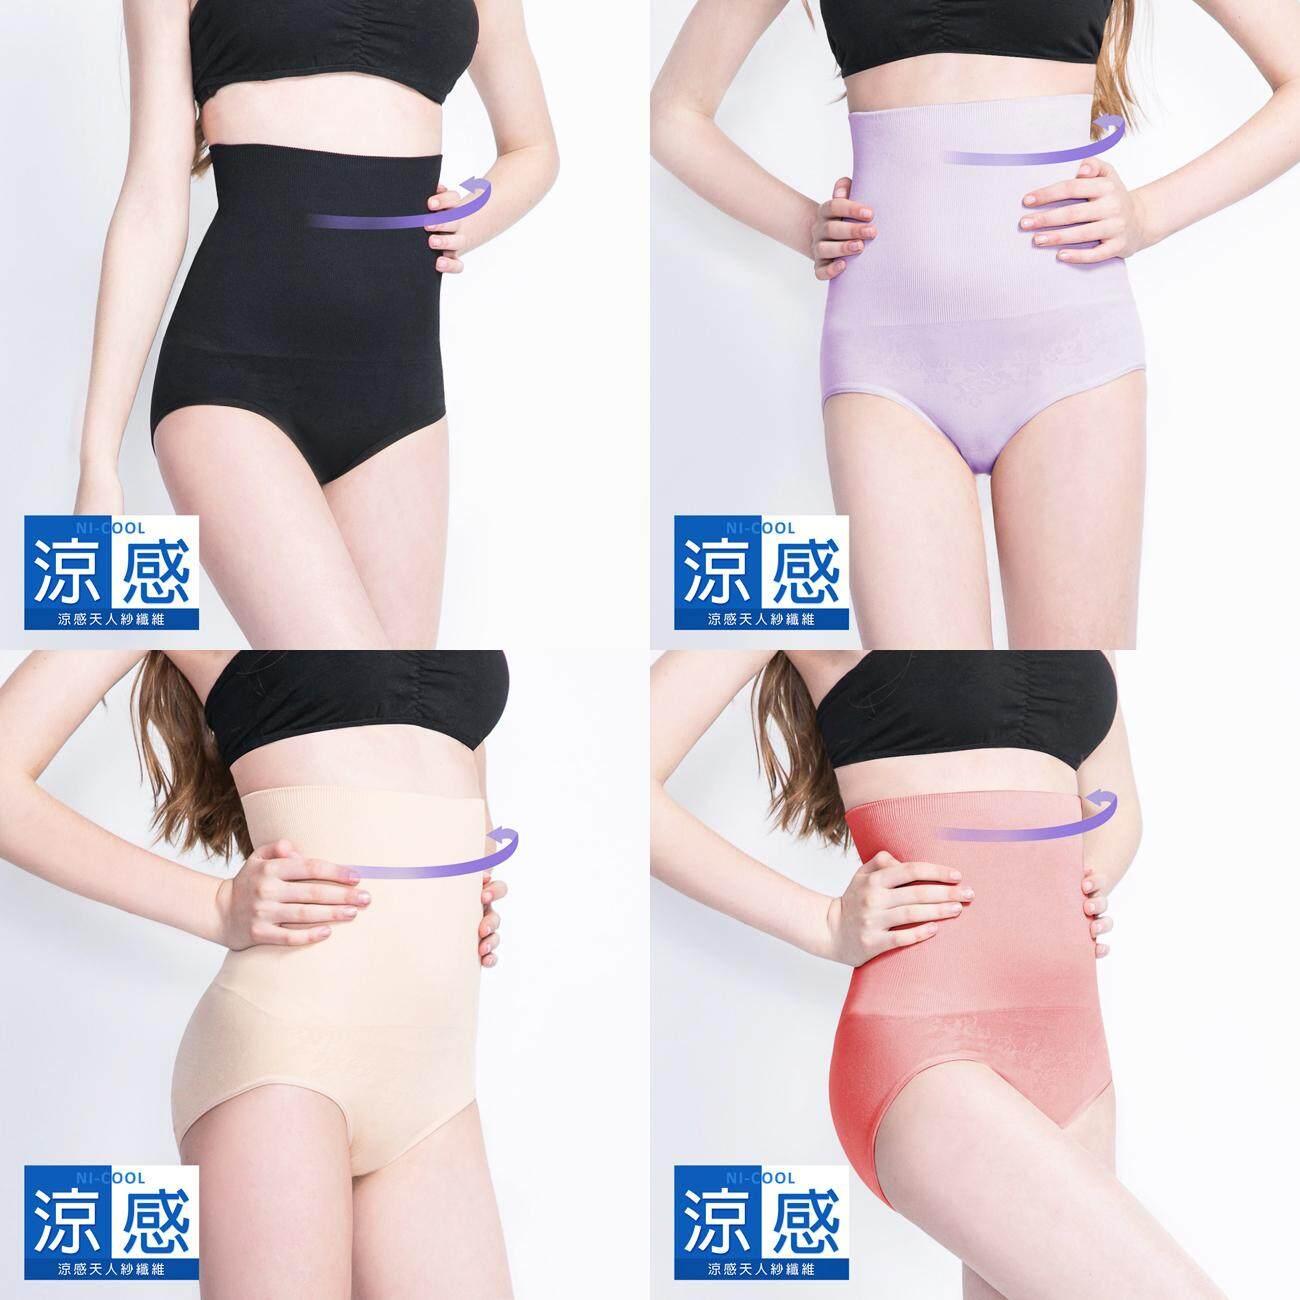 Buy 2 Free 1 Randomly Colour Premium Cooling Super High Waist Slim Panties (100% Made in Taiwan)